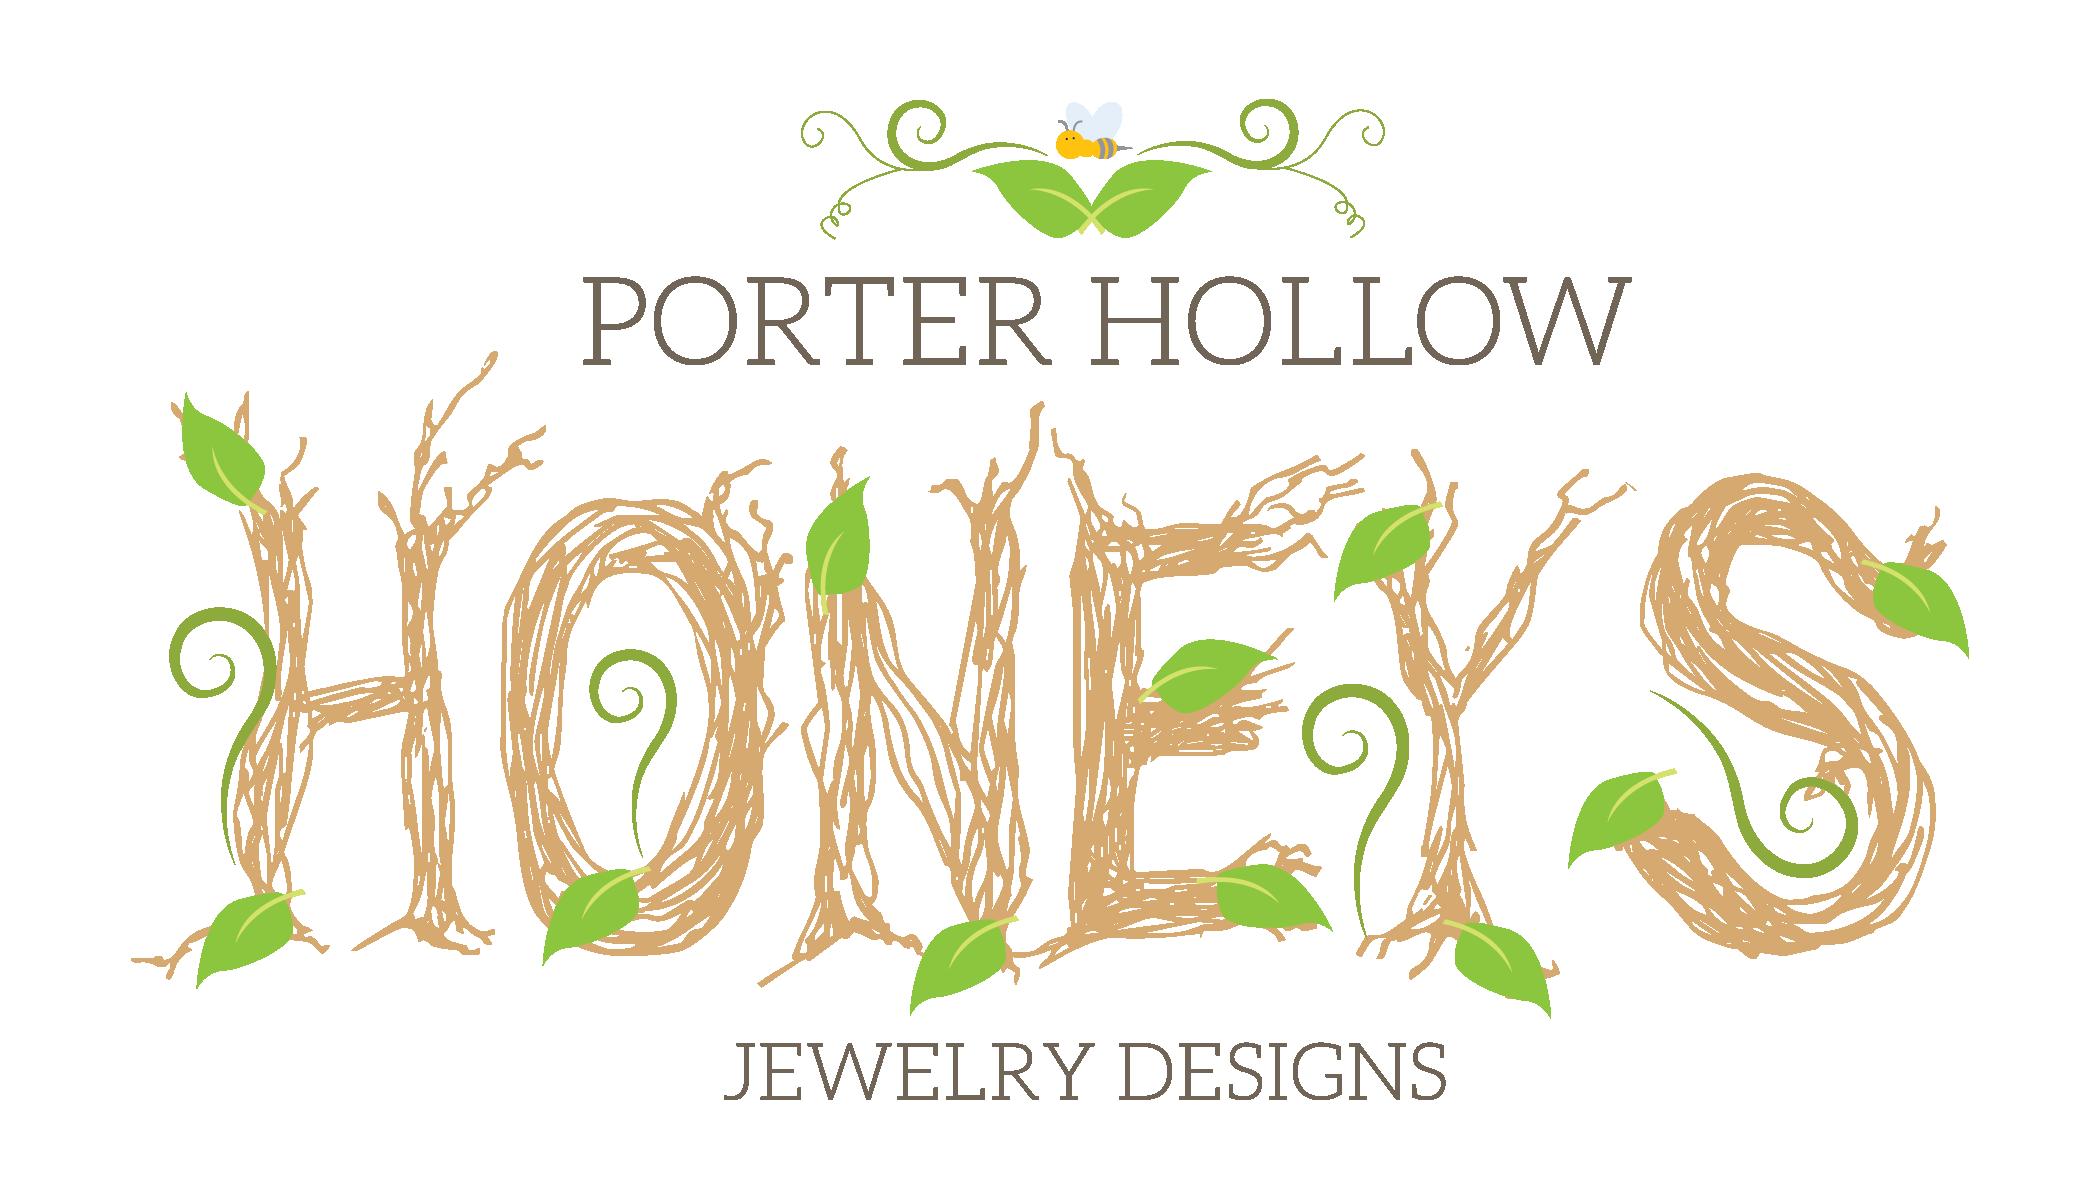 PorterHollowHoneys_logo_main.png